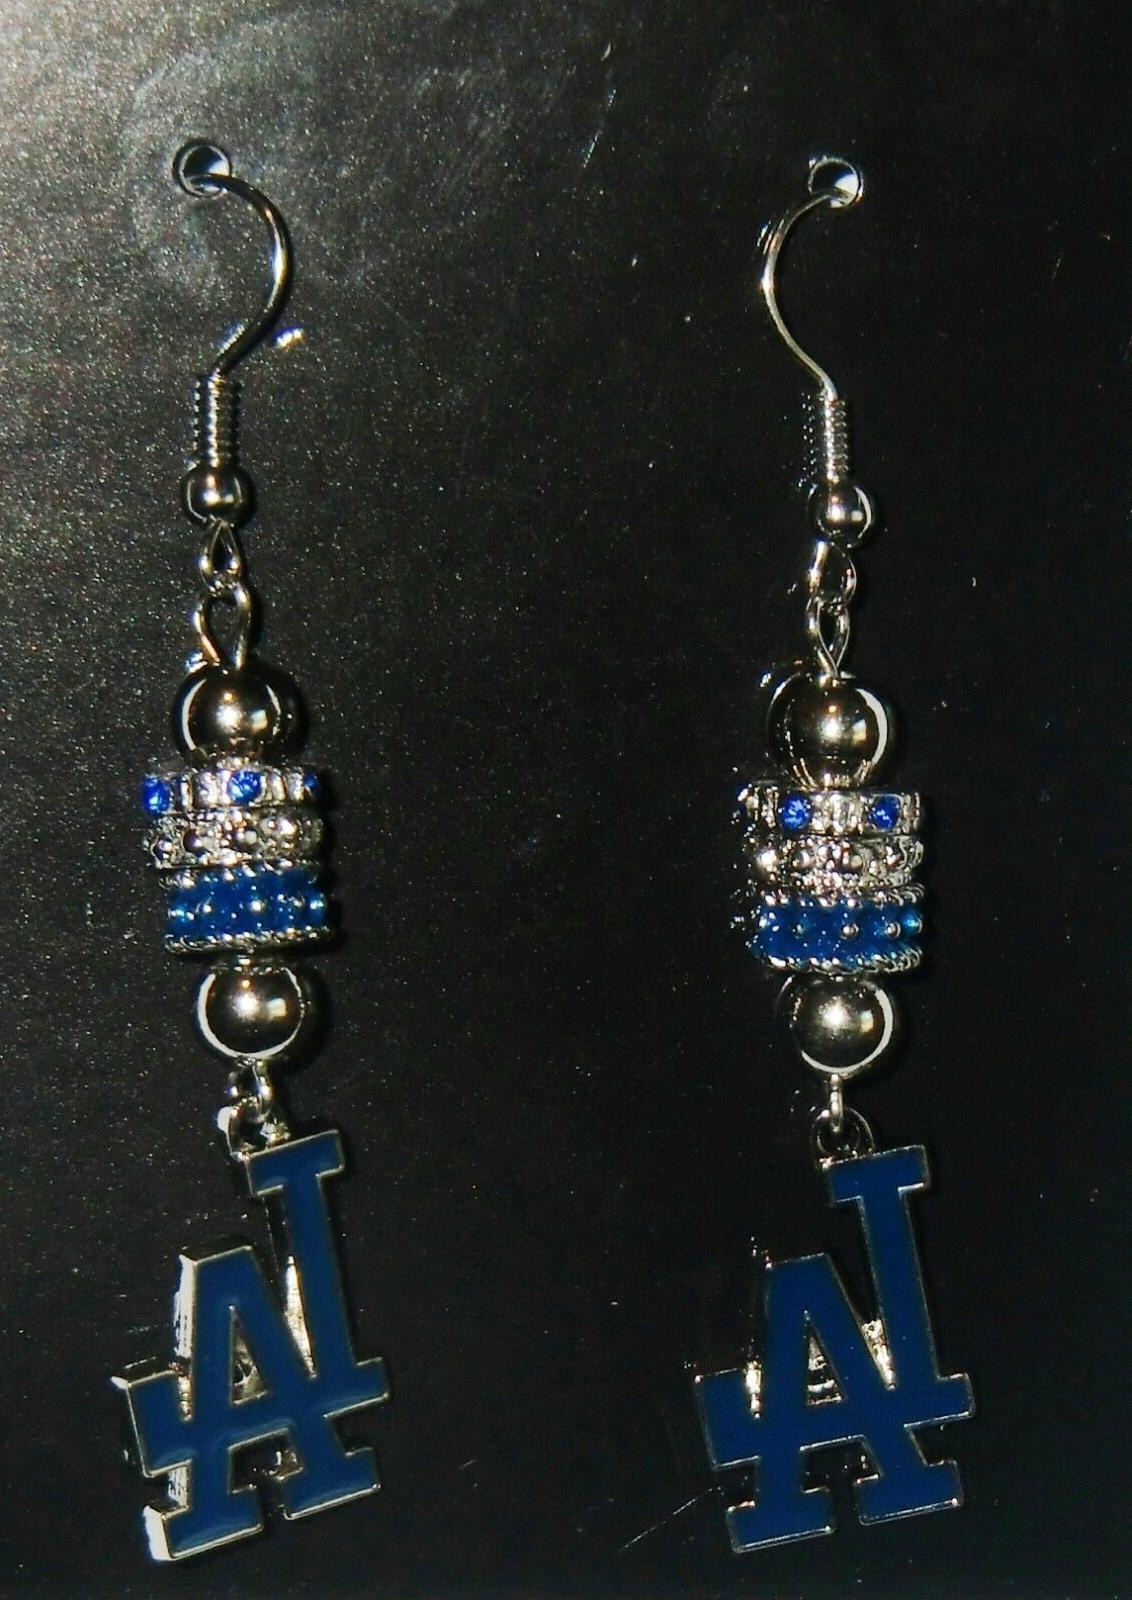 los angeles dodgers dangle earrings euro bead